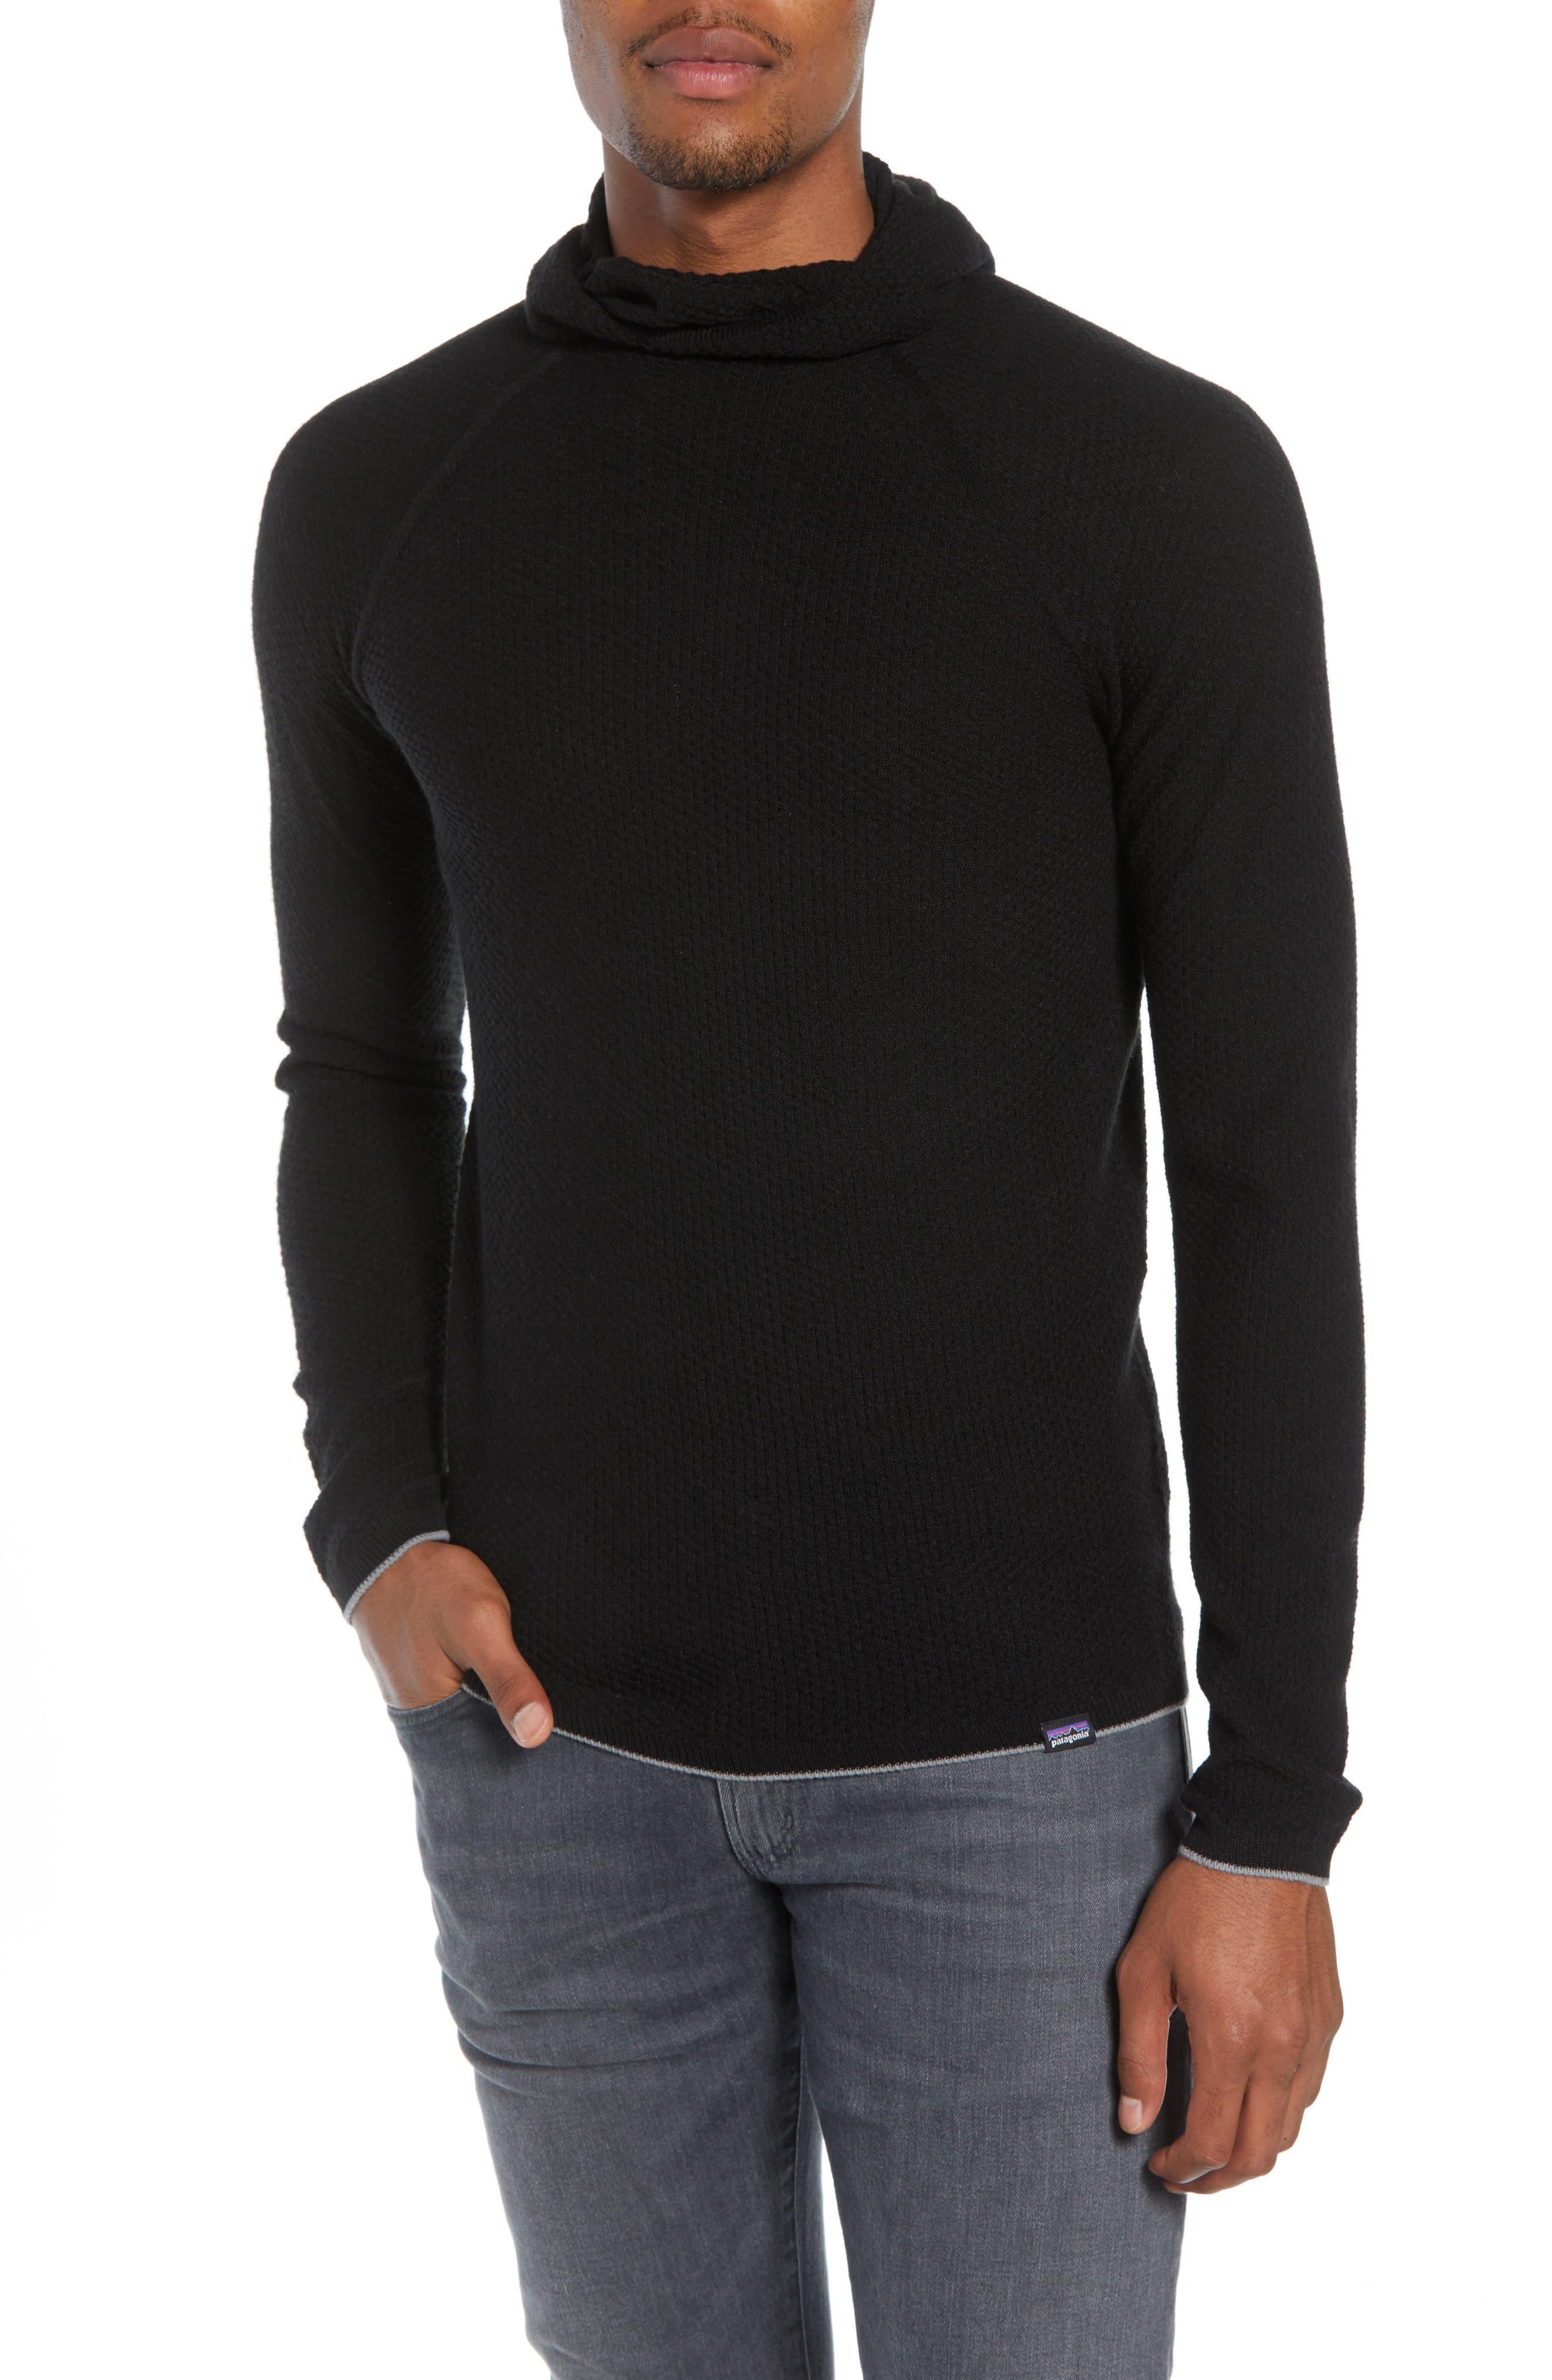 Capilene<sup>®</sup> Air Hoodie,                         Main,                         color, BLACK